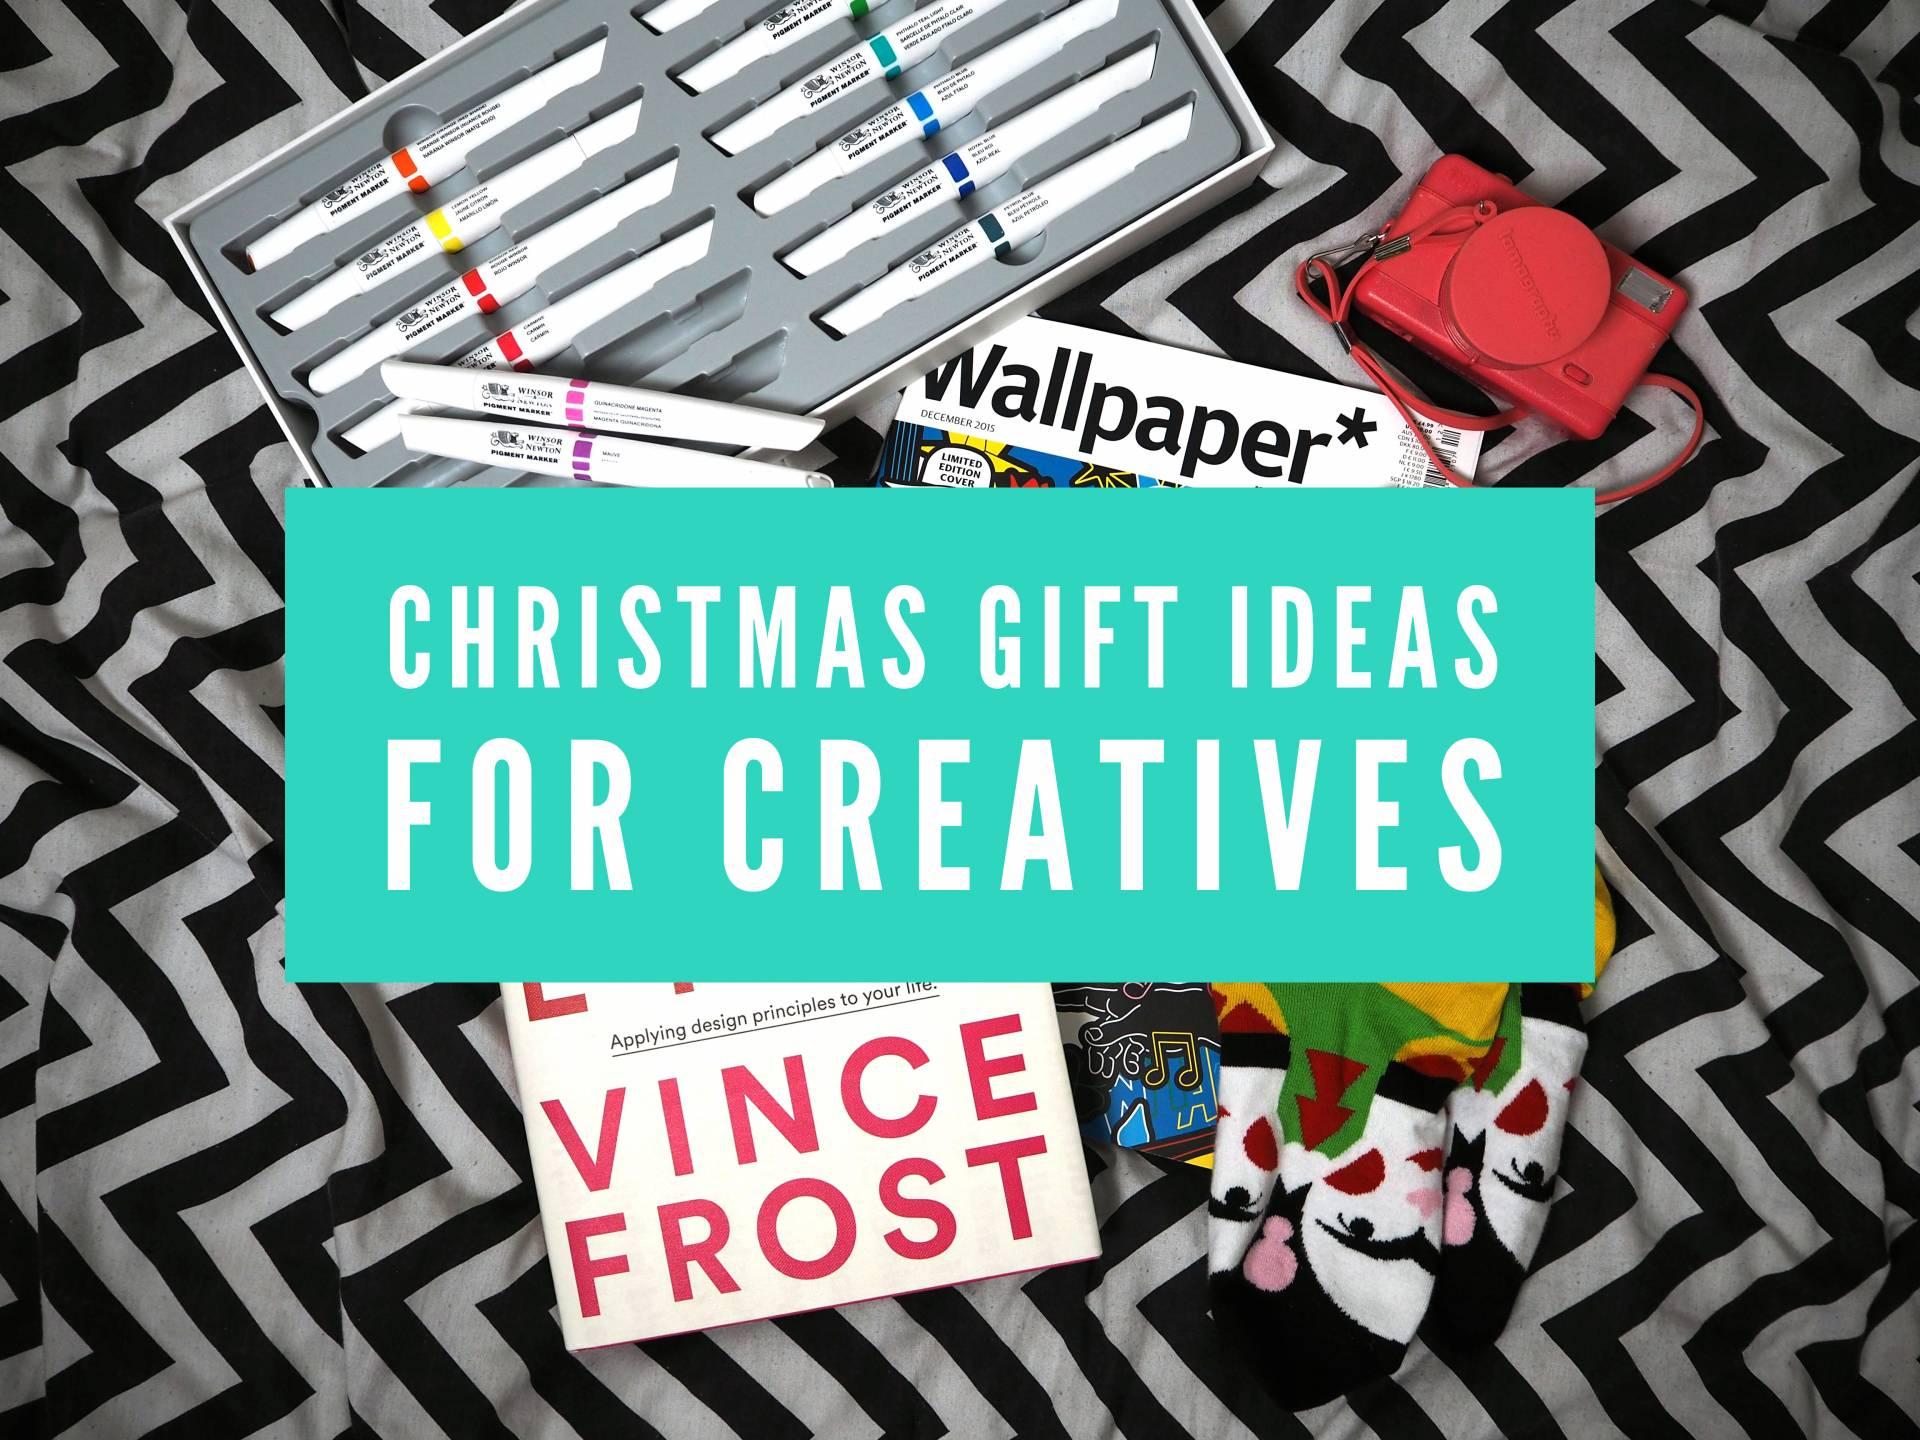 https://graphiquefantastique.com/wp-content/uploads/2015/12/ChristmasGiftIdeasForCreatives.jpg